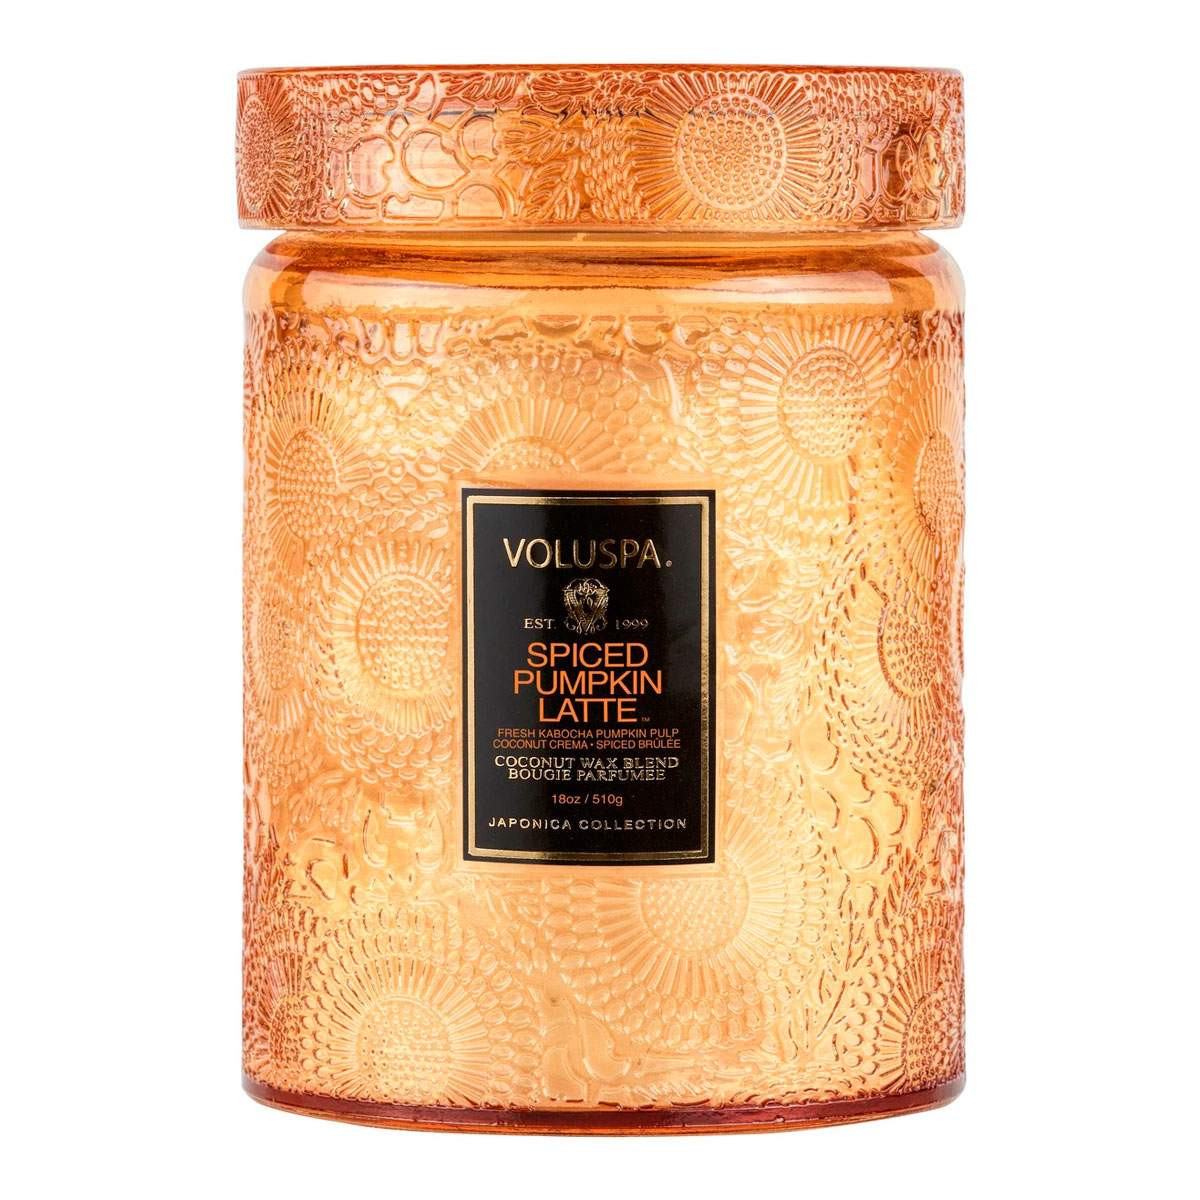 Vela Relevo Spiced Pumpkin Latte Voluspa 100H